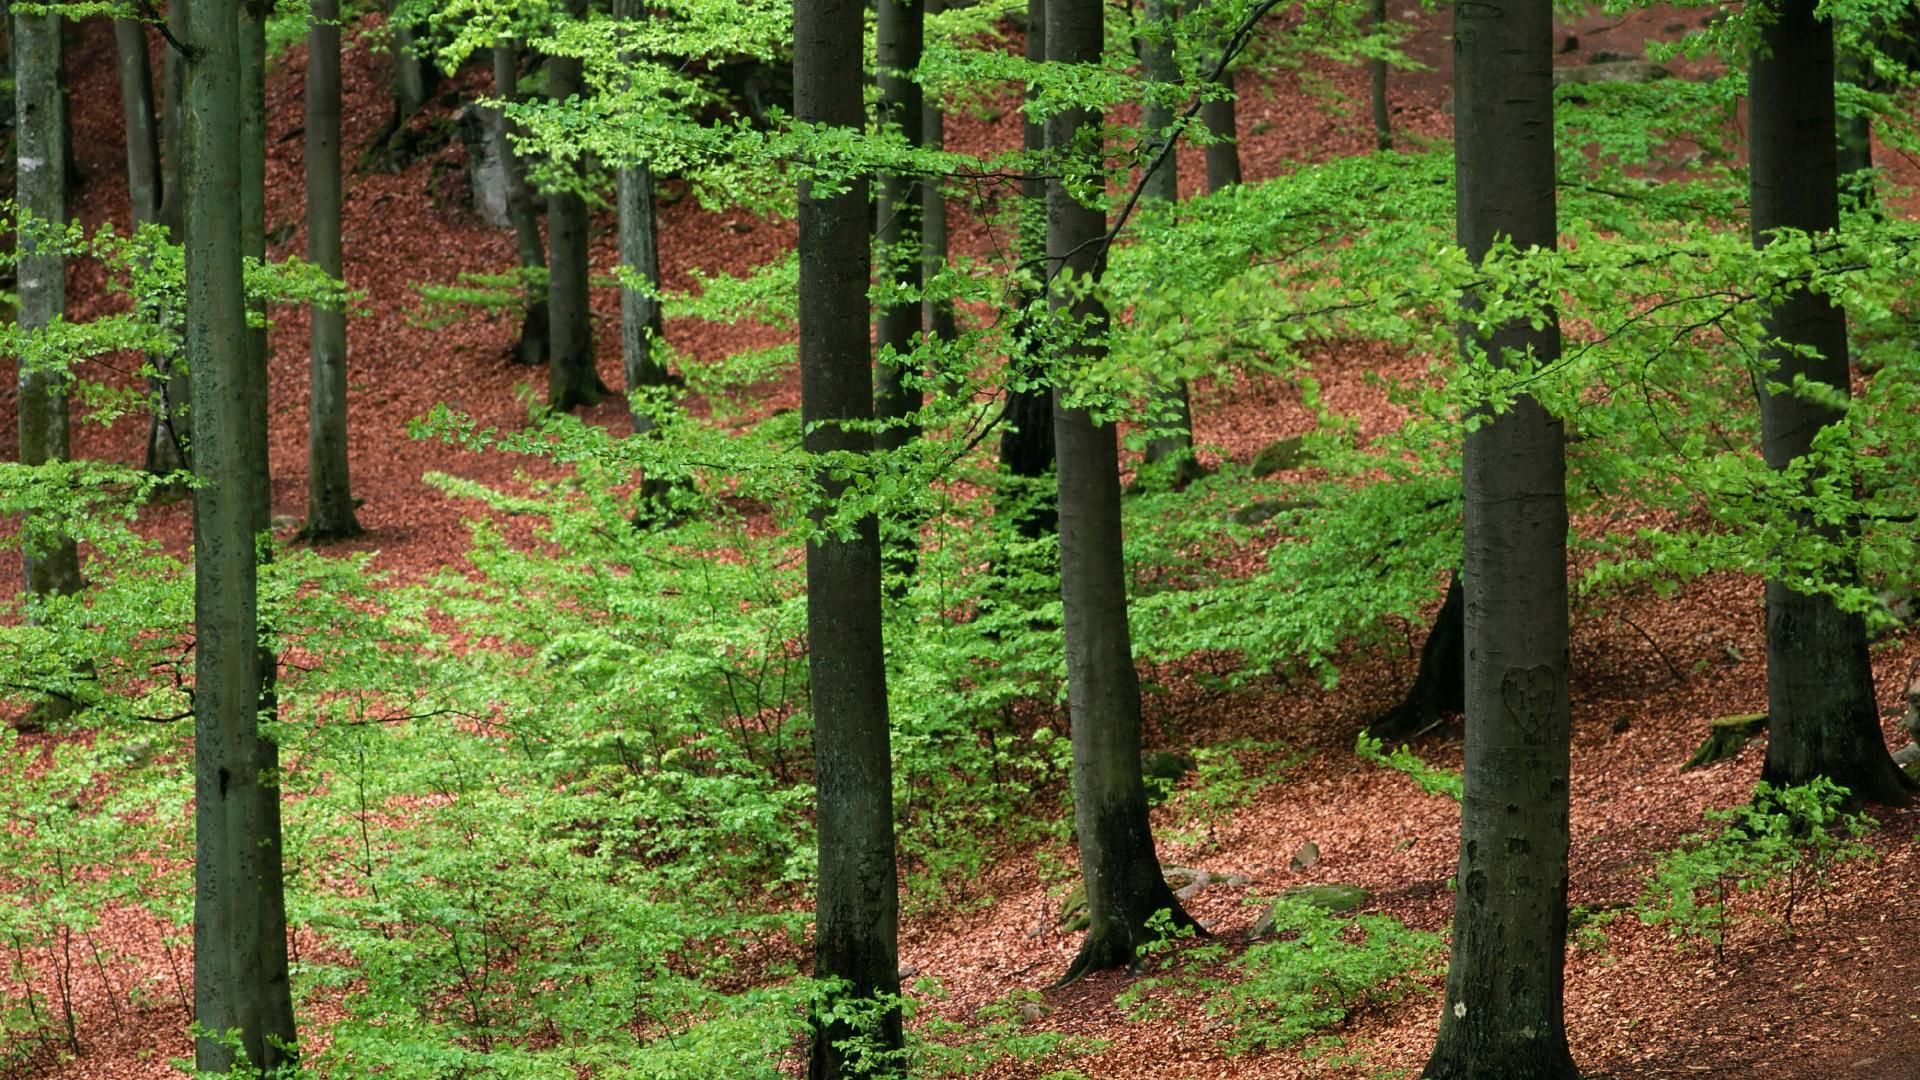 Hd wallpaper tree - Forest Tree Hd Wallpaper